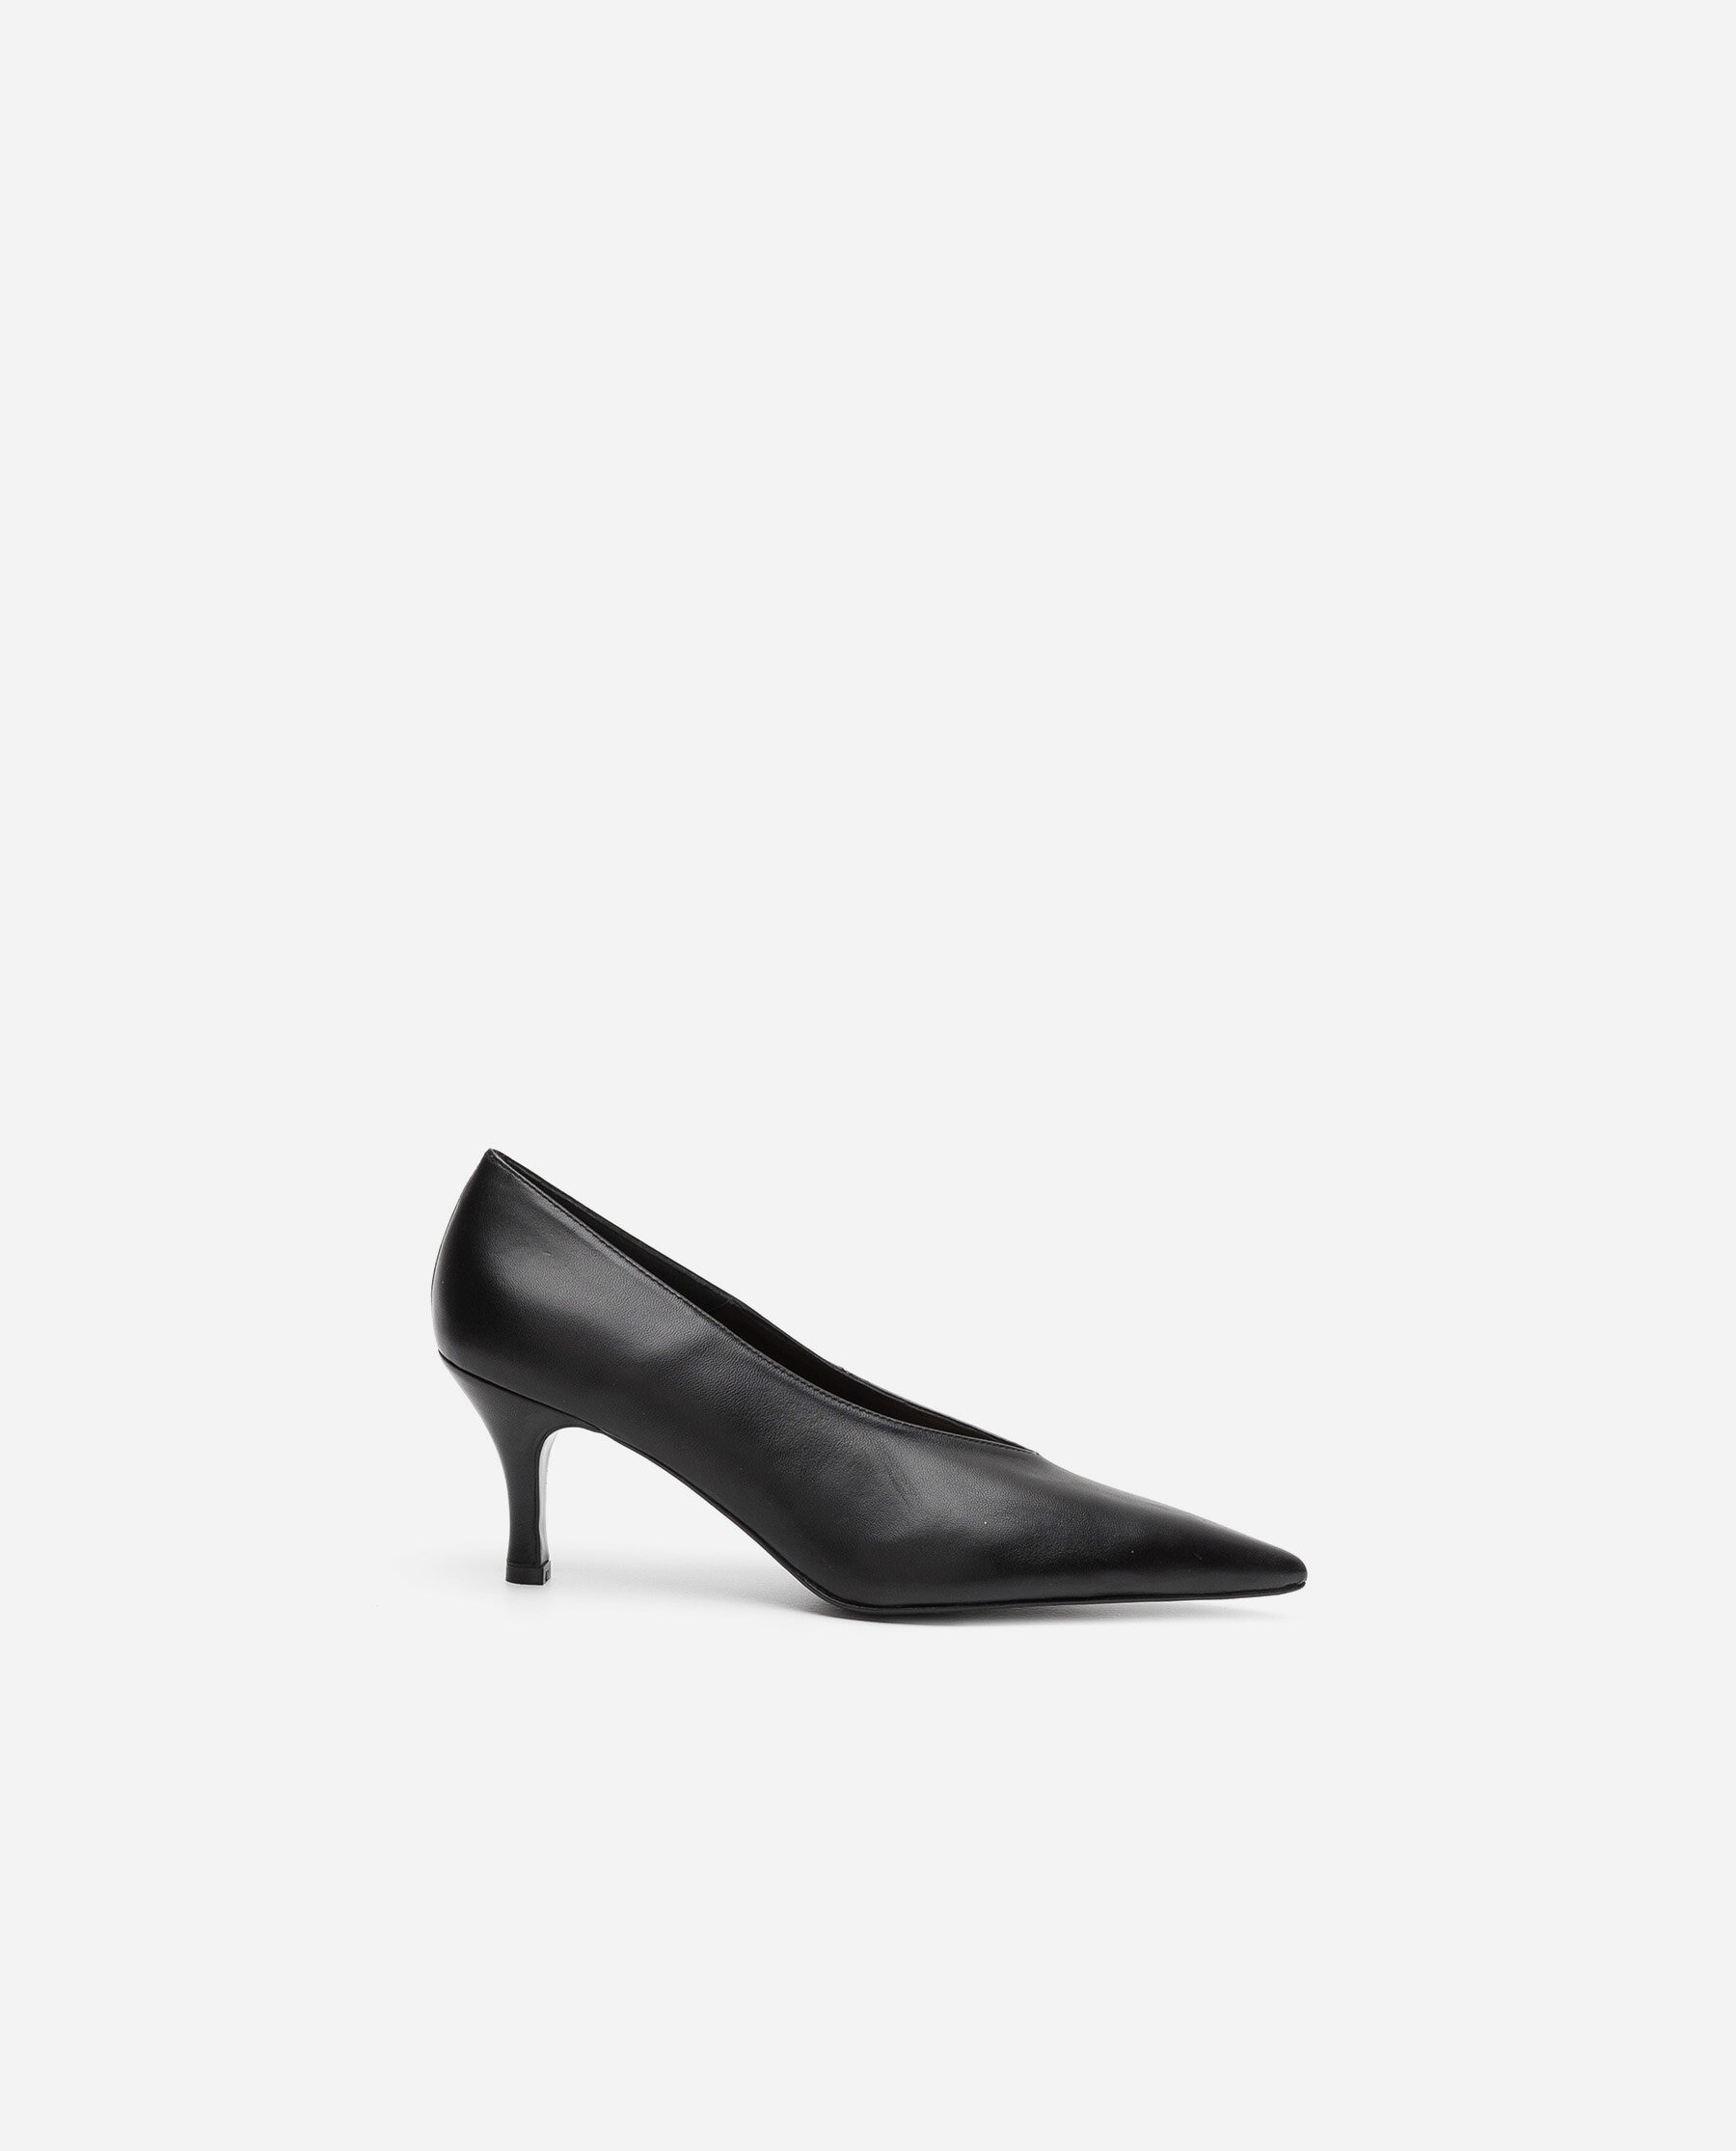 Fabienne Leather Black